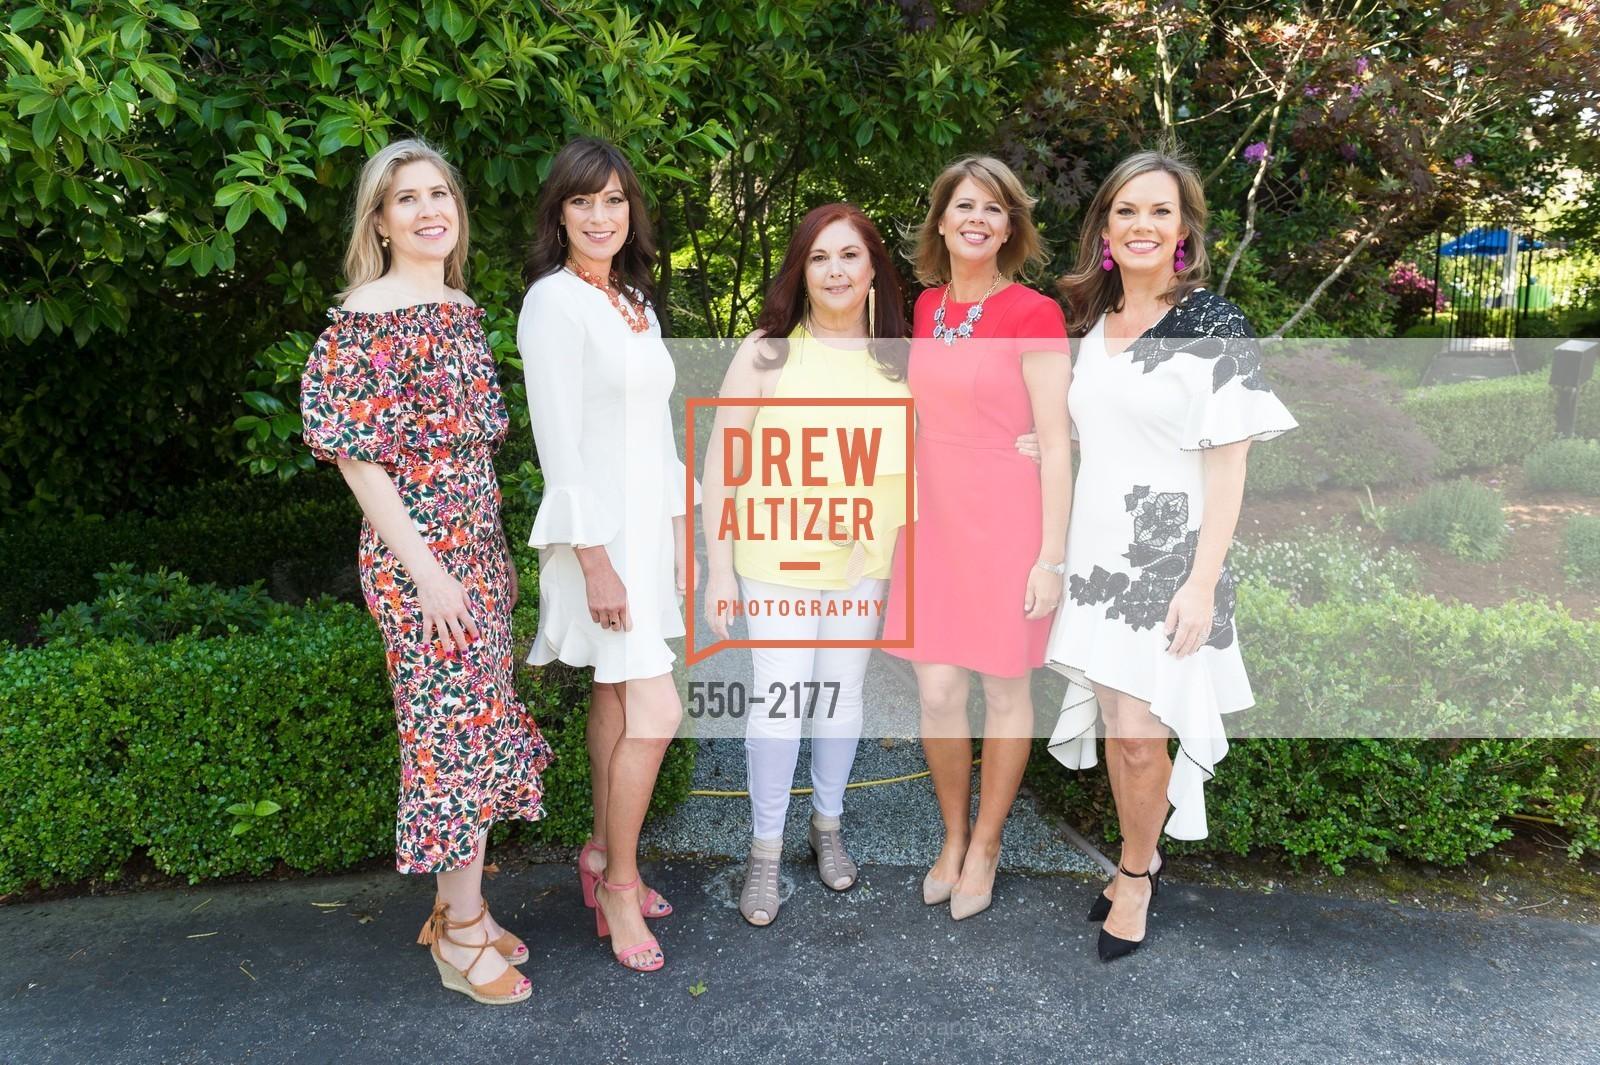 Francie Jain, Meghan Crowell, Diana Conti, Kelly Markson, Renee Fischer, Photo #550-2177